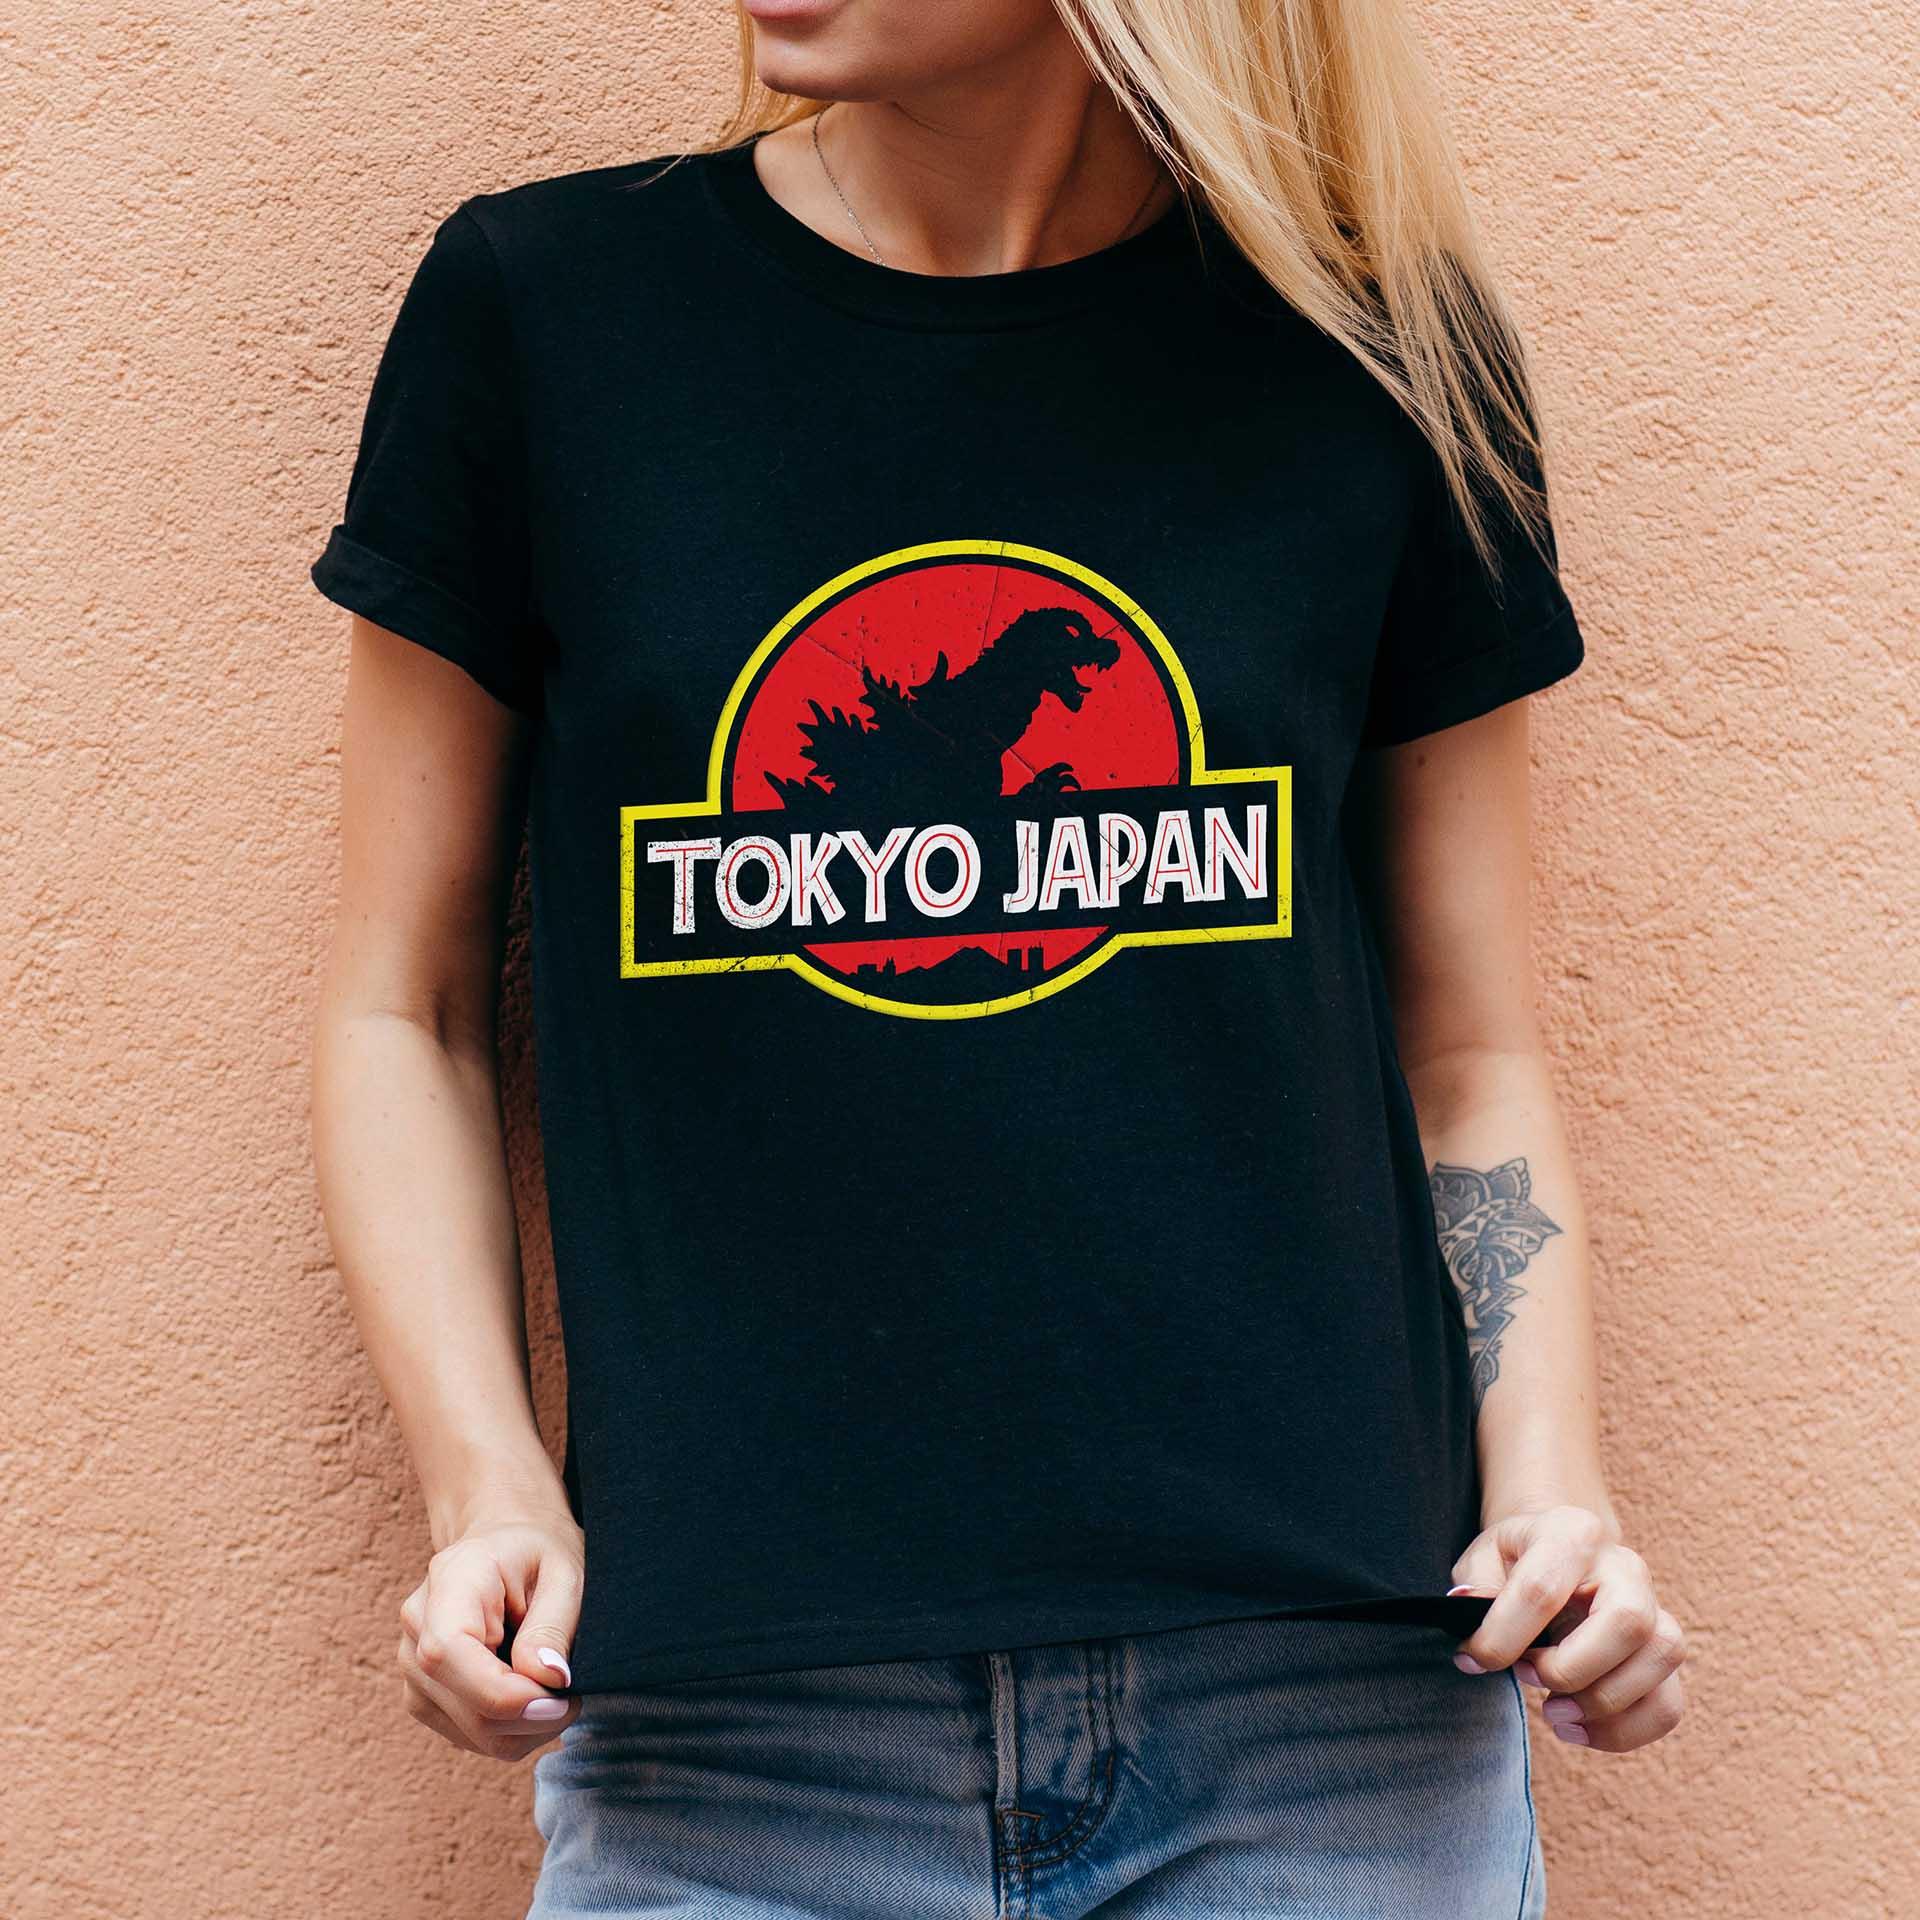 Camiseta Feminina Unissex Tokyo Japan: Jurassic Park (Preta) - EV